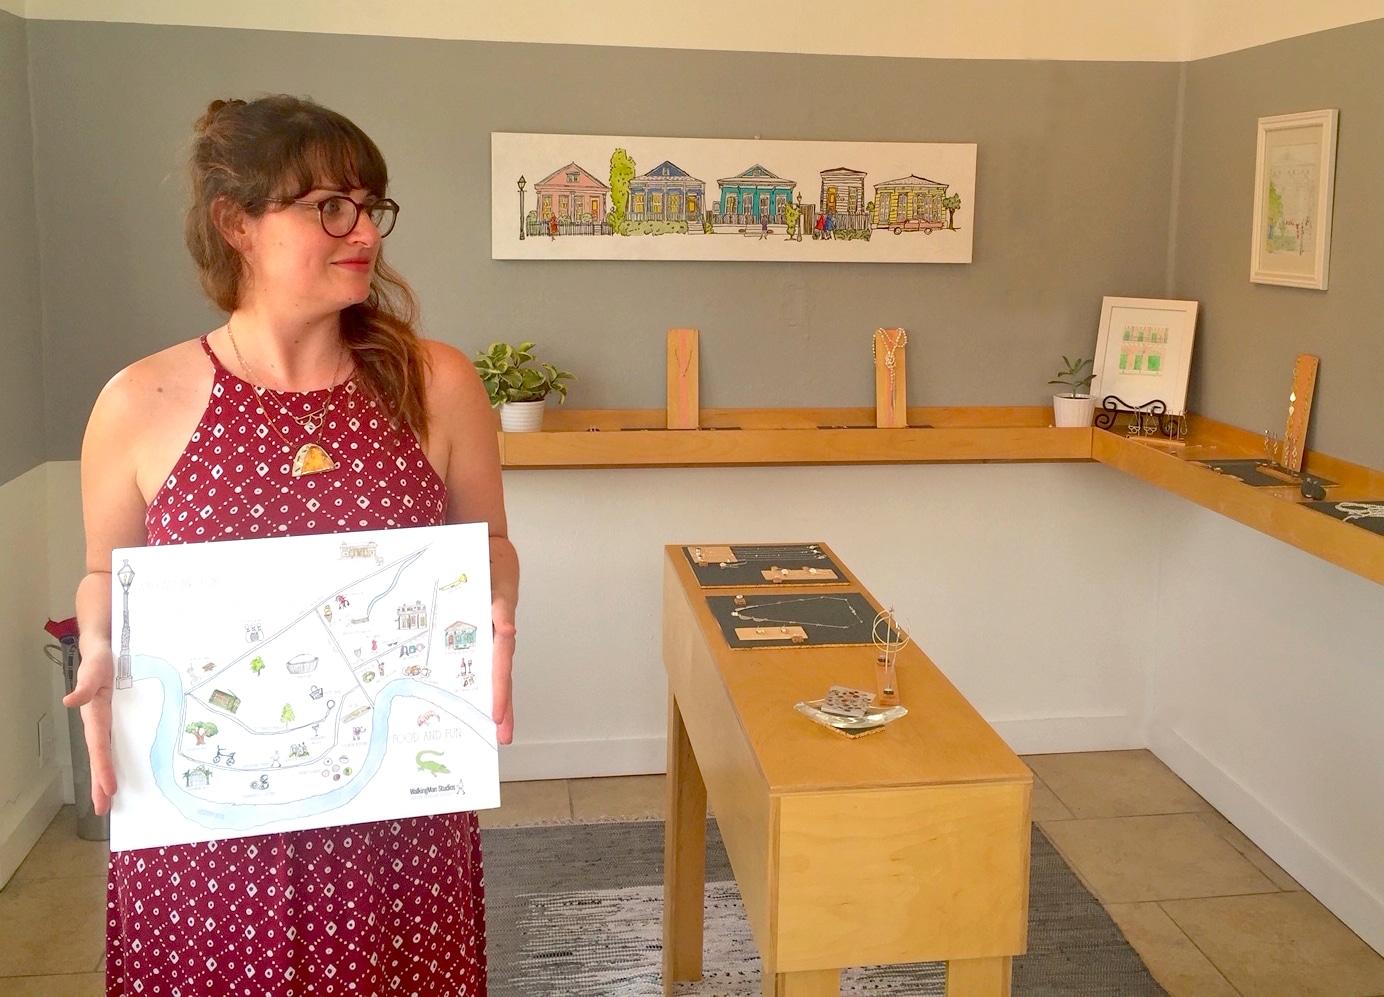 StayLocal presents Shopkeeper Stories: Maggie Covert of WalkingMan Studios